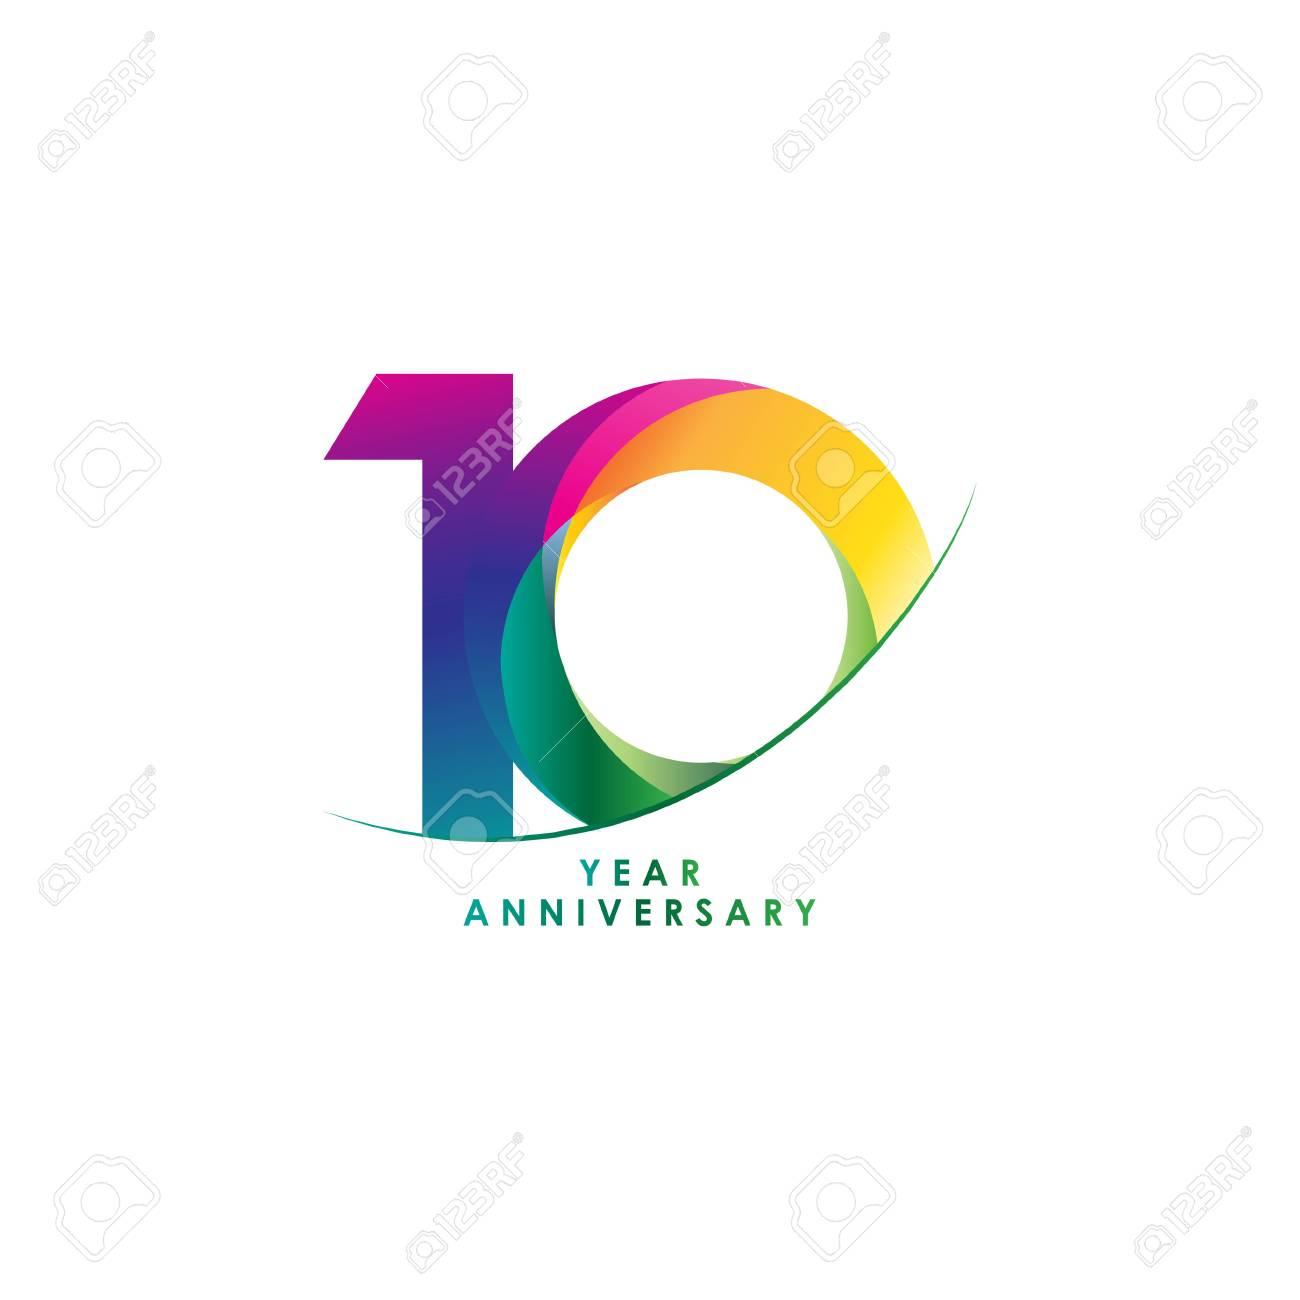 10 Year Anniversary Vector Template Design Illustration - 119227340